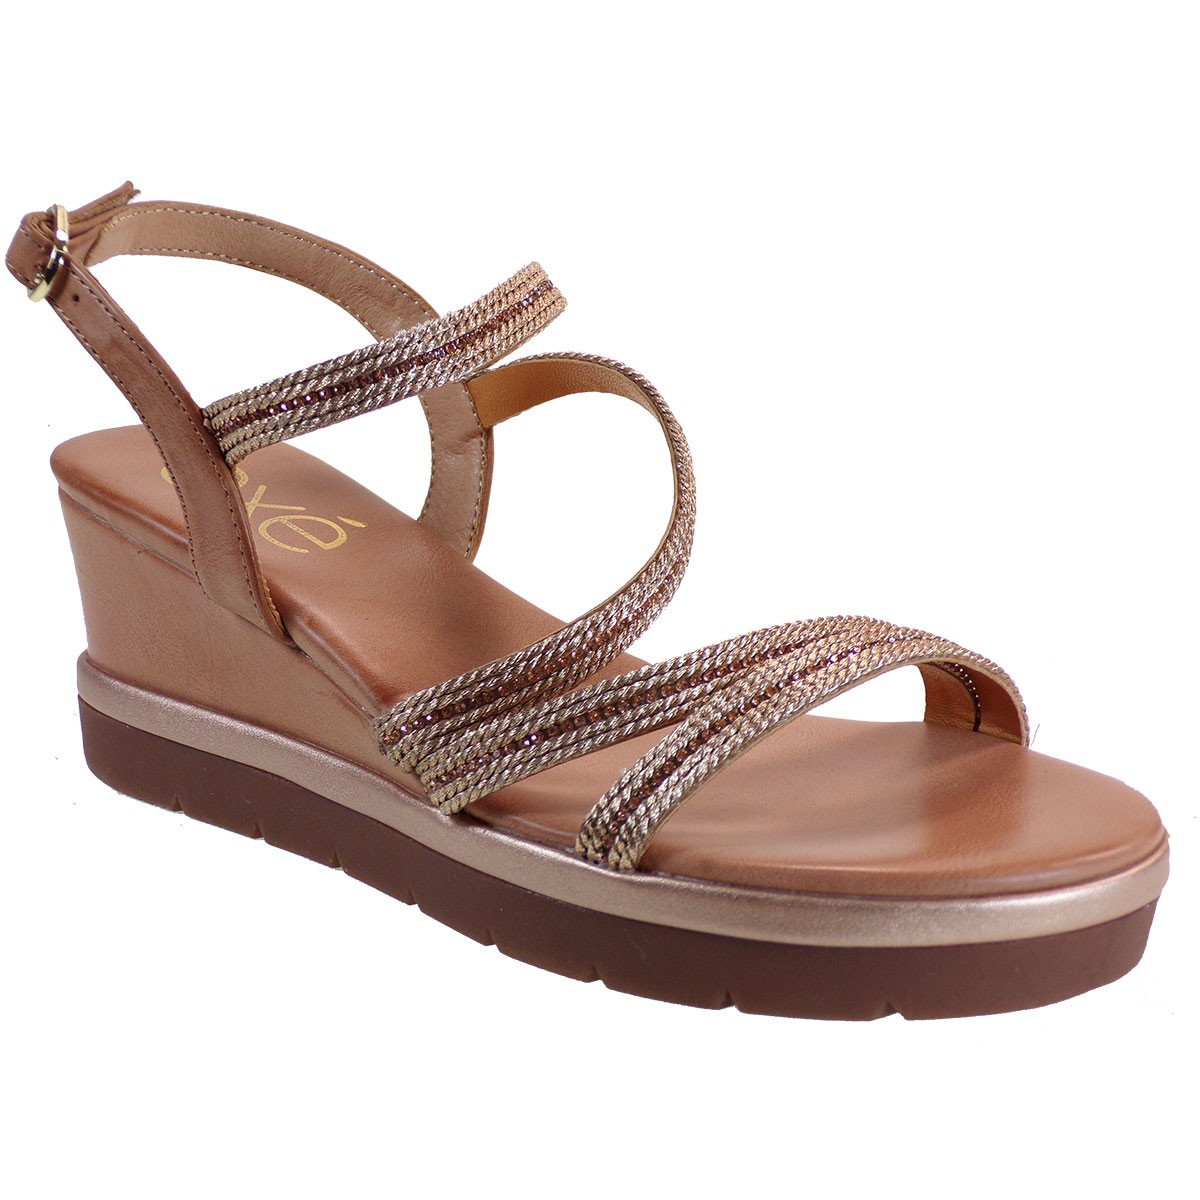 EXE Shoes Γυναικεία Πέδιλα Πλατφόρμες 902-IPANEMA-940 Ροζ Χρυσό Στας M47009043P50